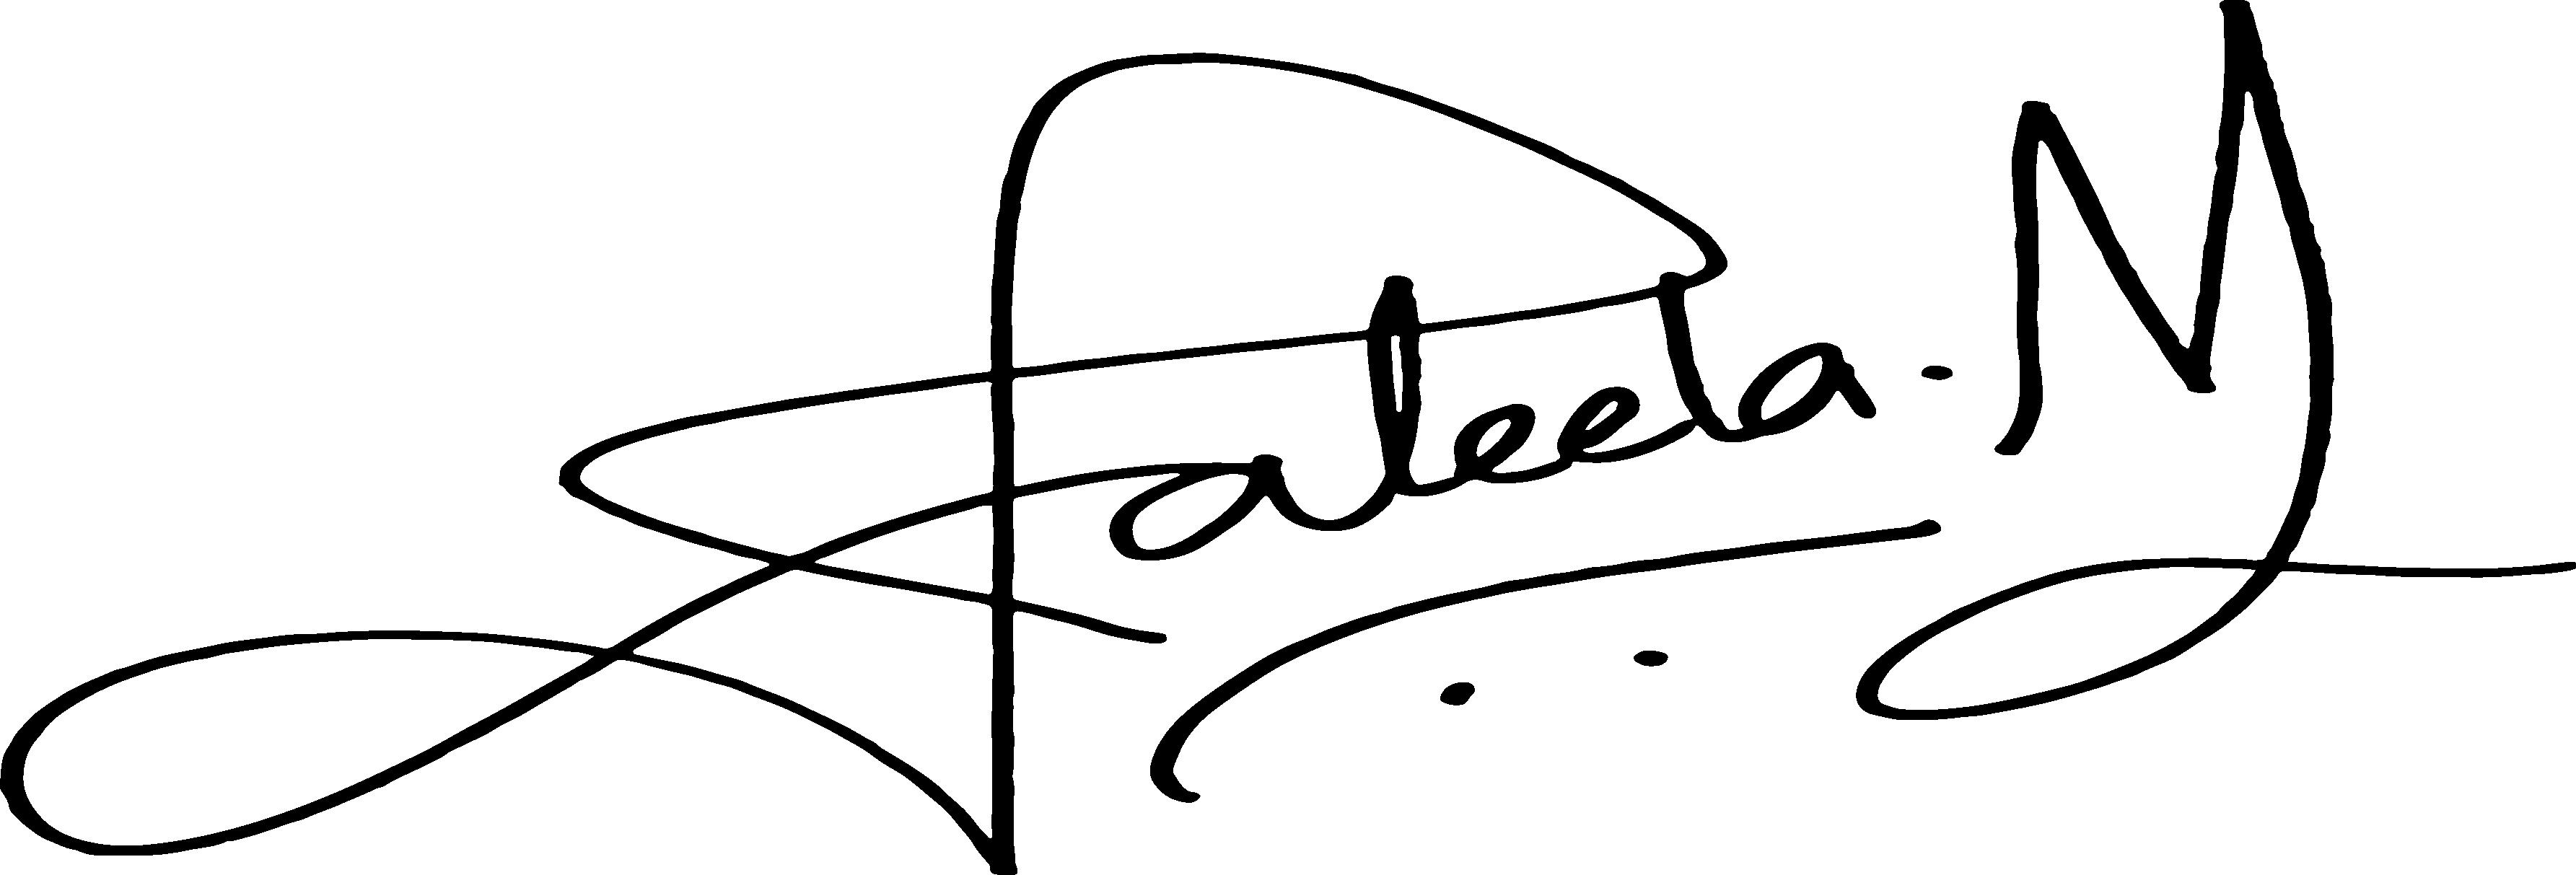 Jaleela Niaz's Signature